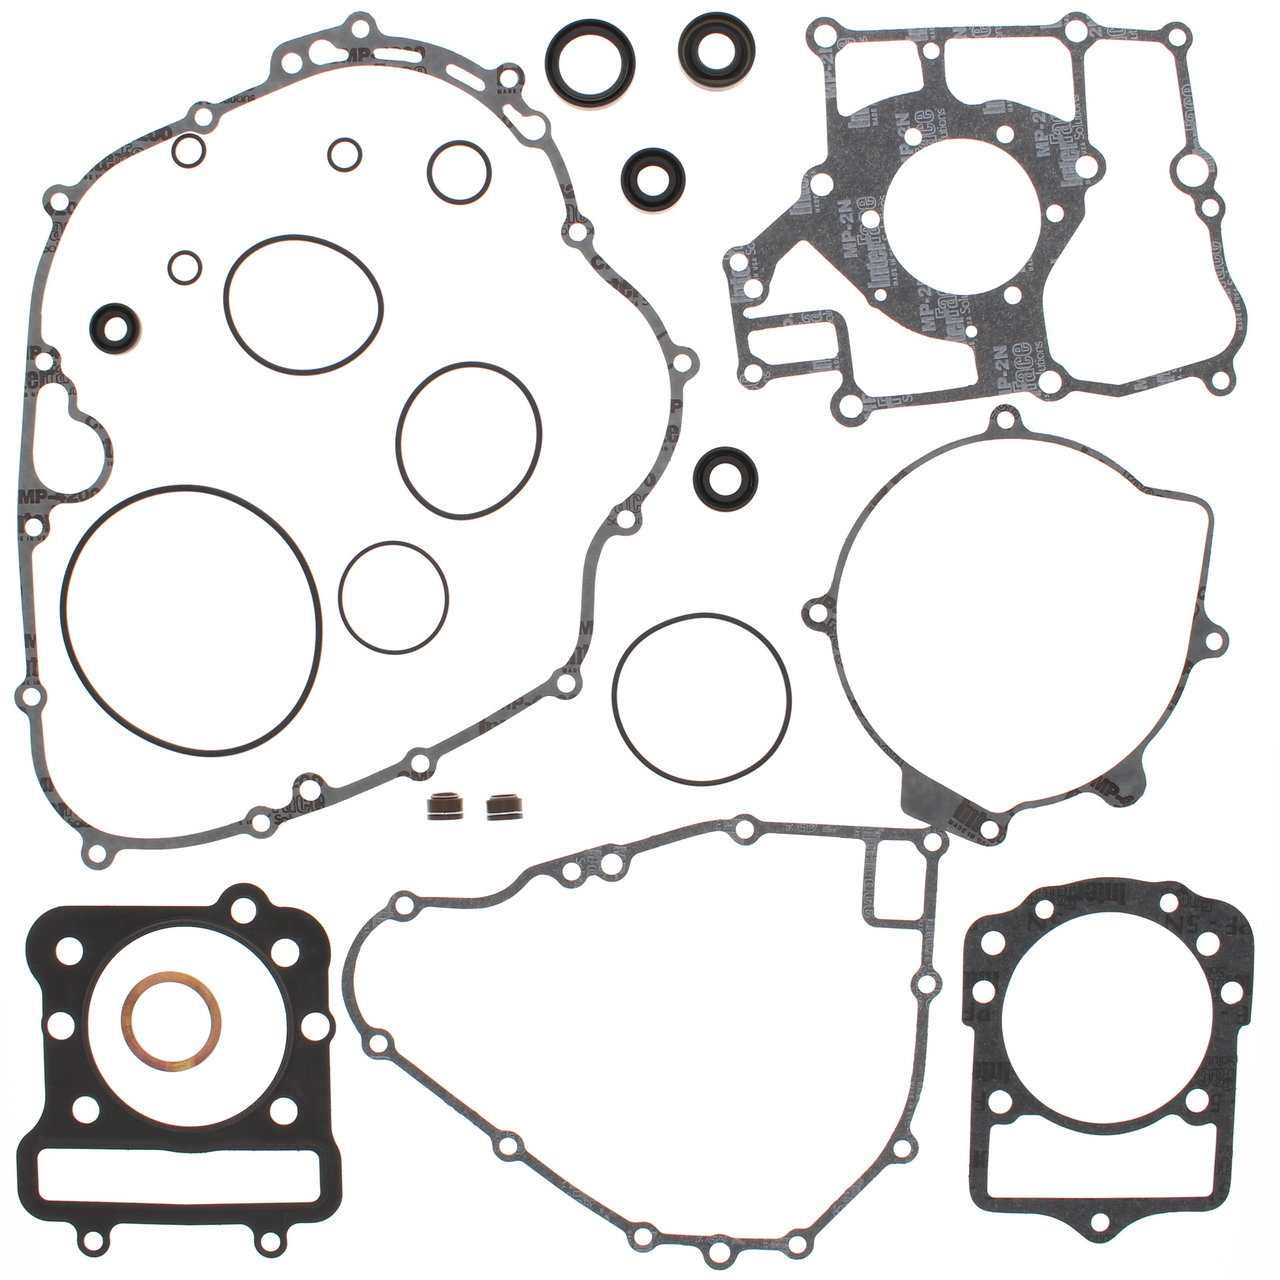 Complete Gasket Kit W Oil Seals Kawasaki Klf300b Bayou